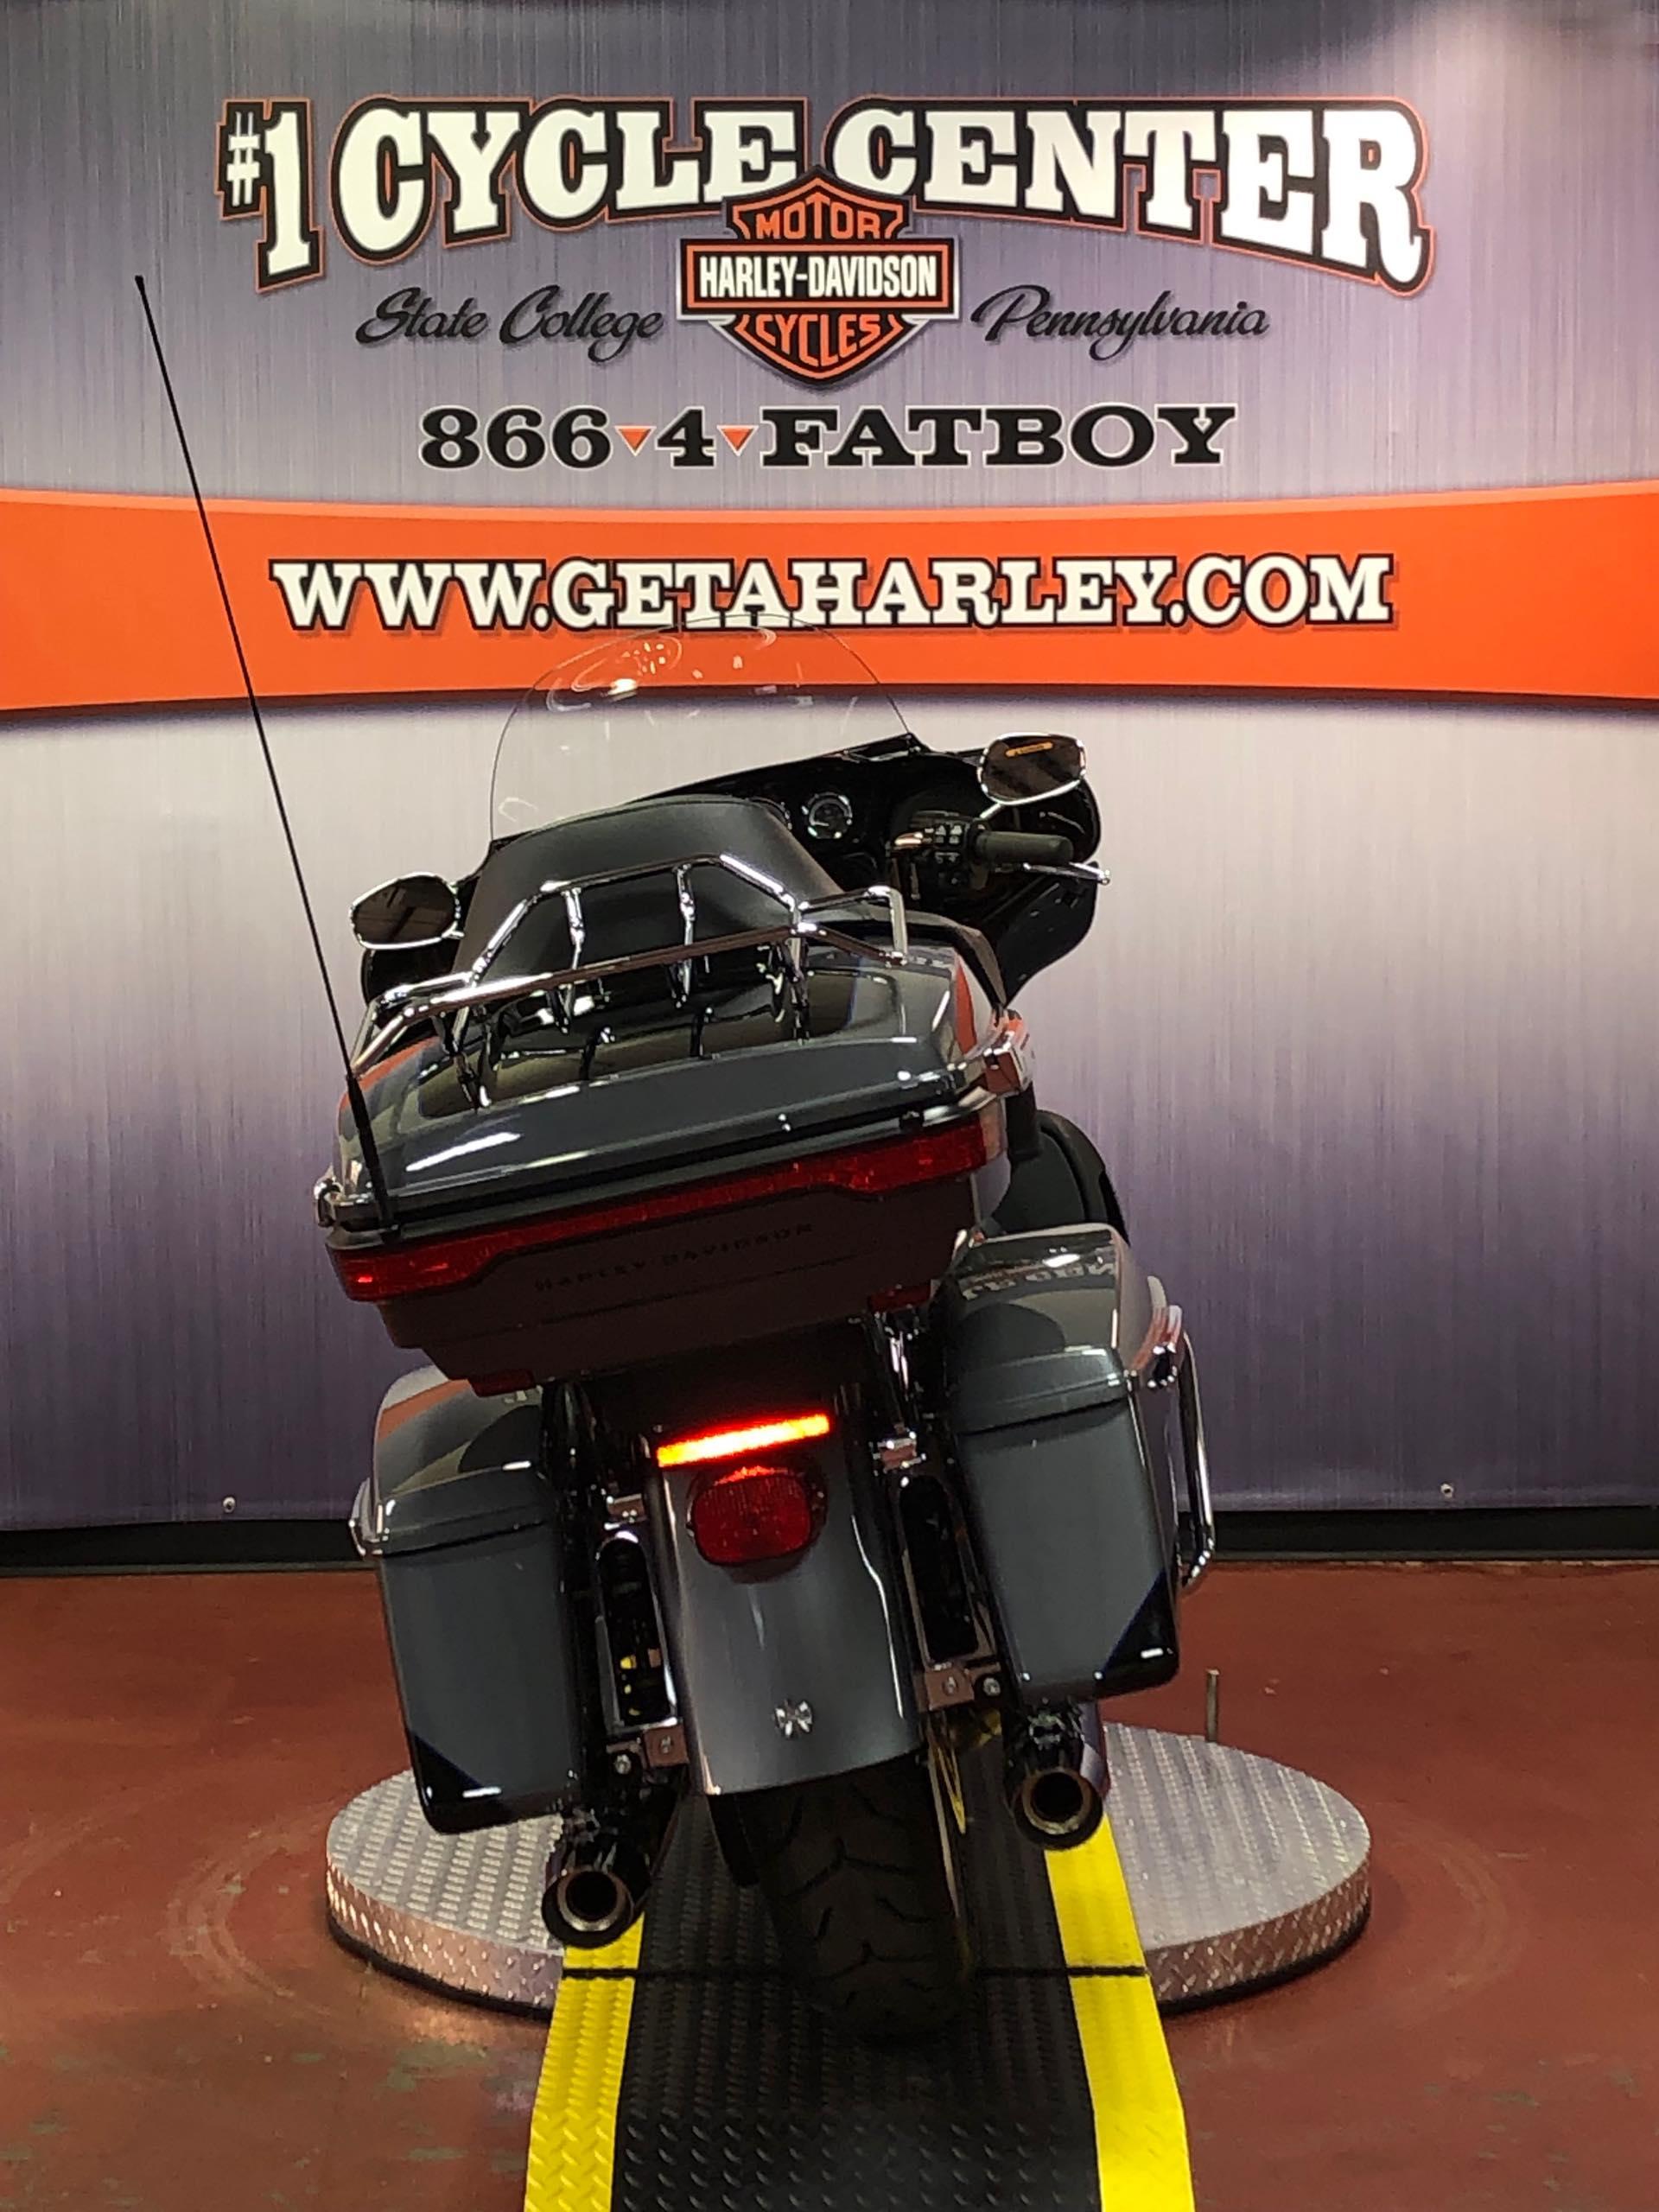 2021 Harley-Davidson FLHTK at #1 Cycle Center Harley-Davidson